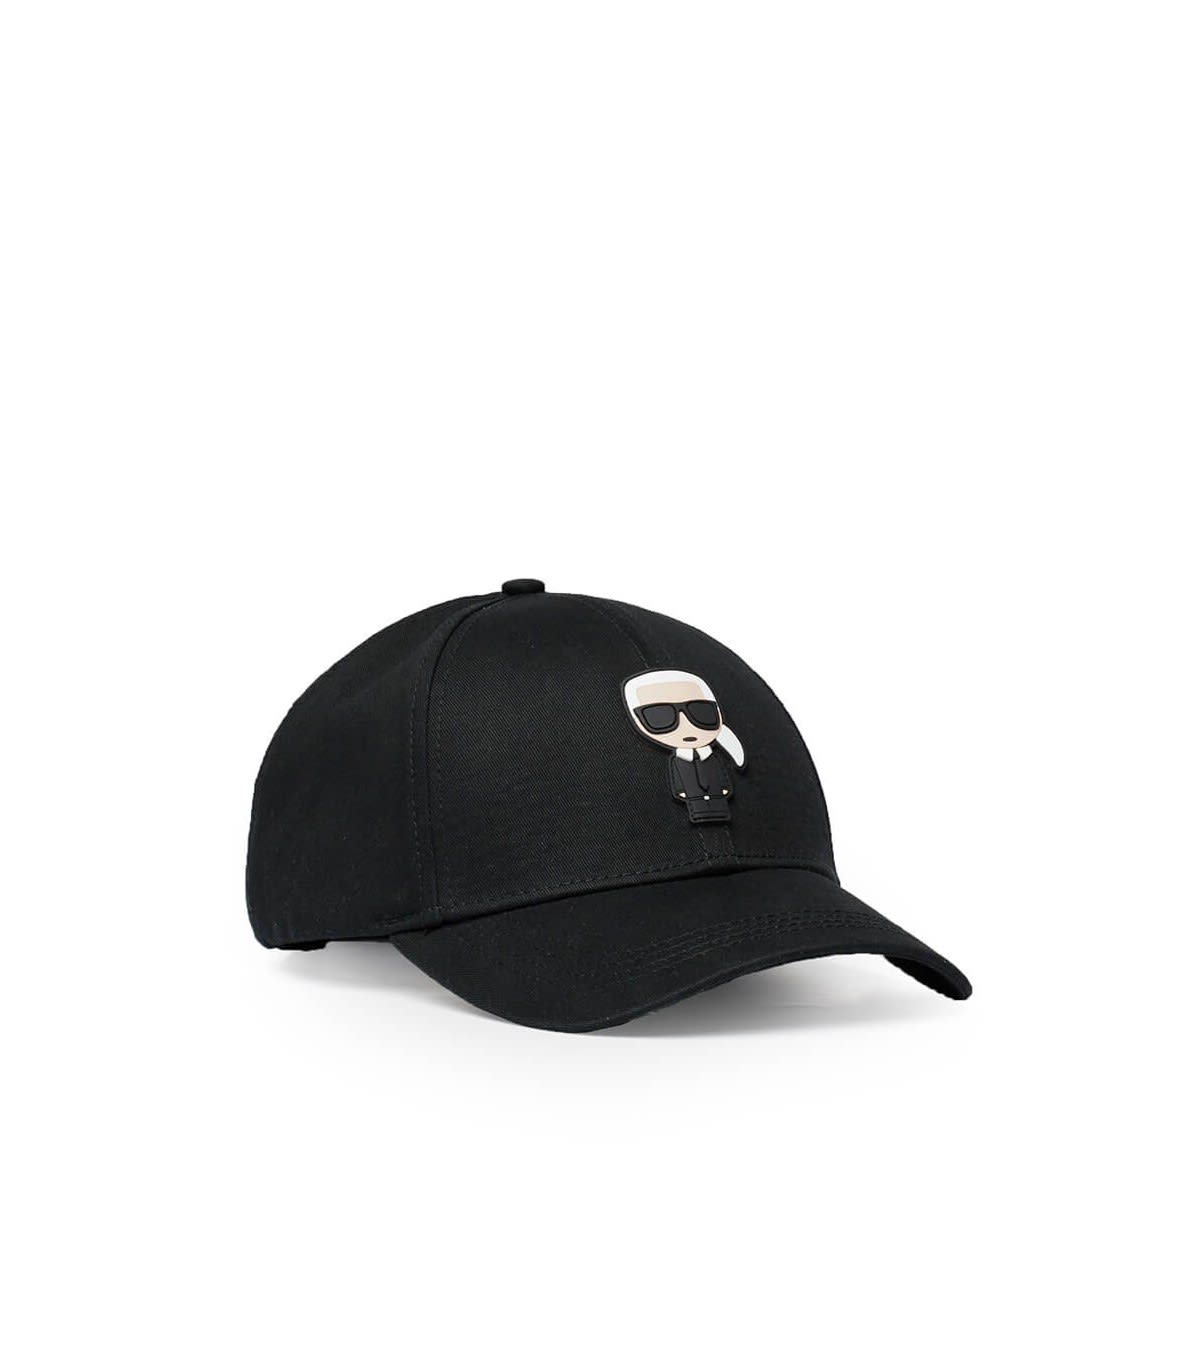 Karl Lagerfeld Accessories BLACK K/IKONIK BASEBALL CAP